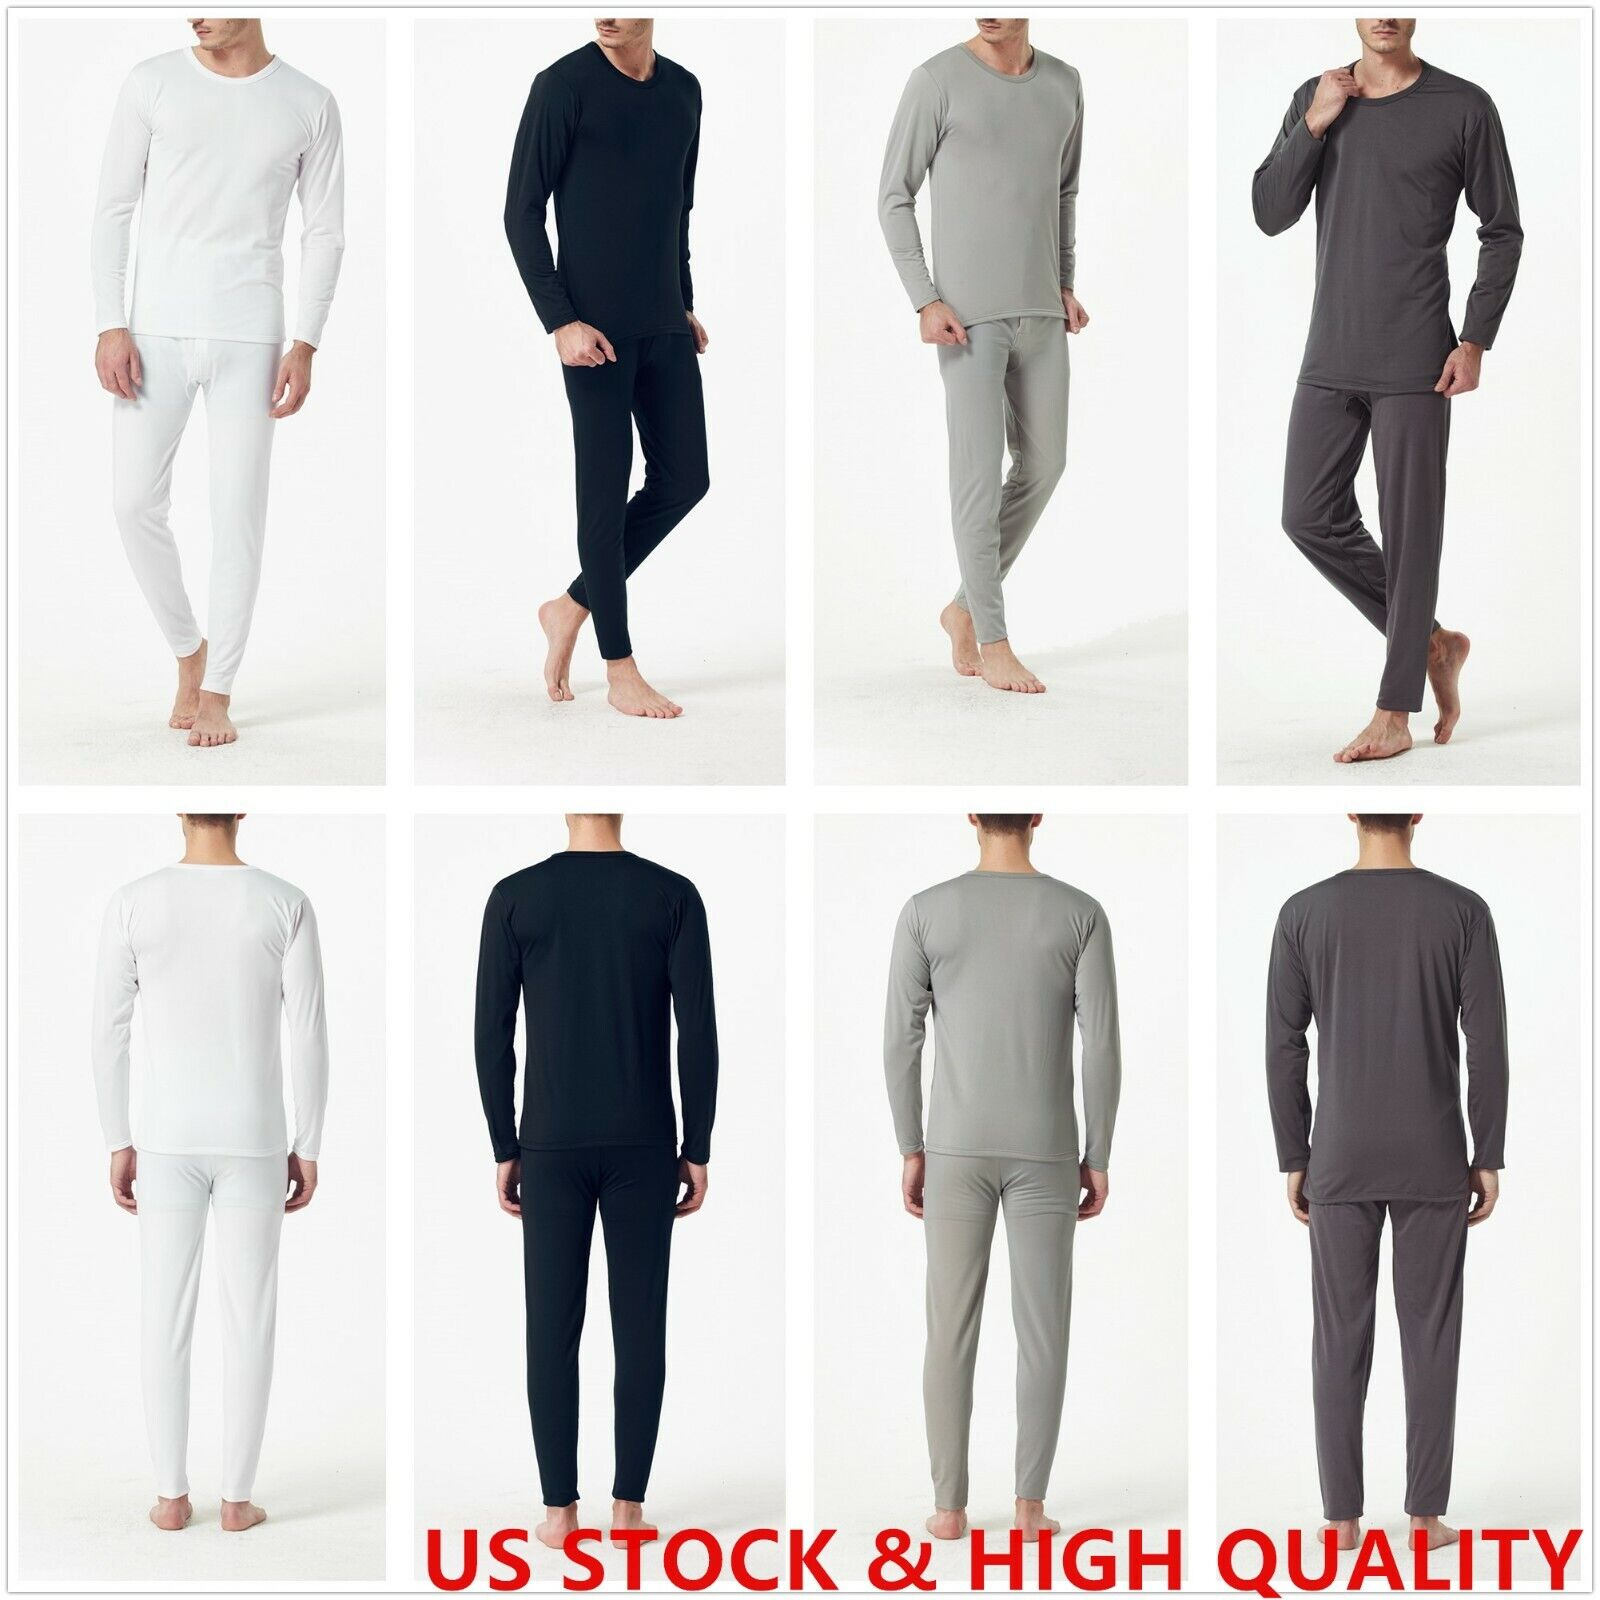 Phoeron Men's Thermal Underwear Set Top & Bottom Long Johns